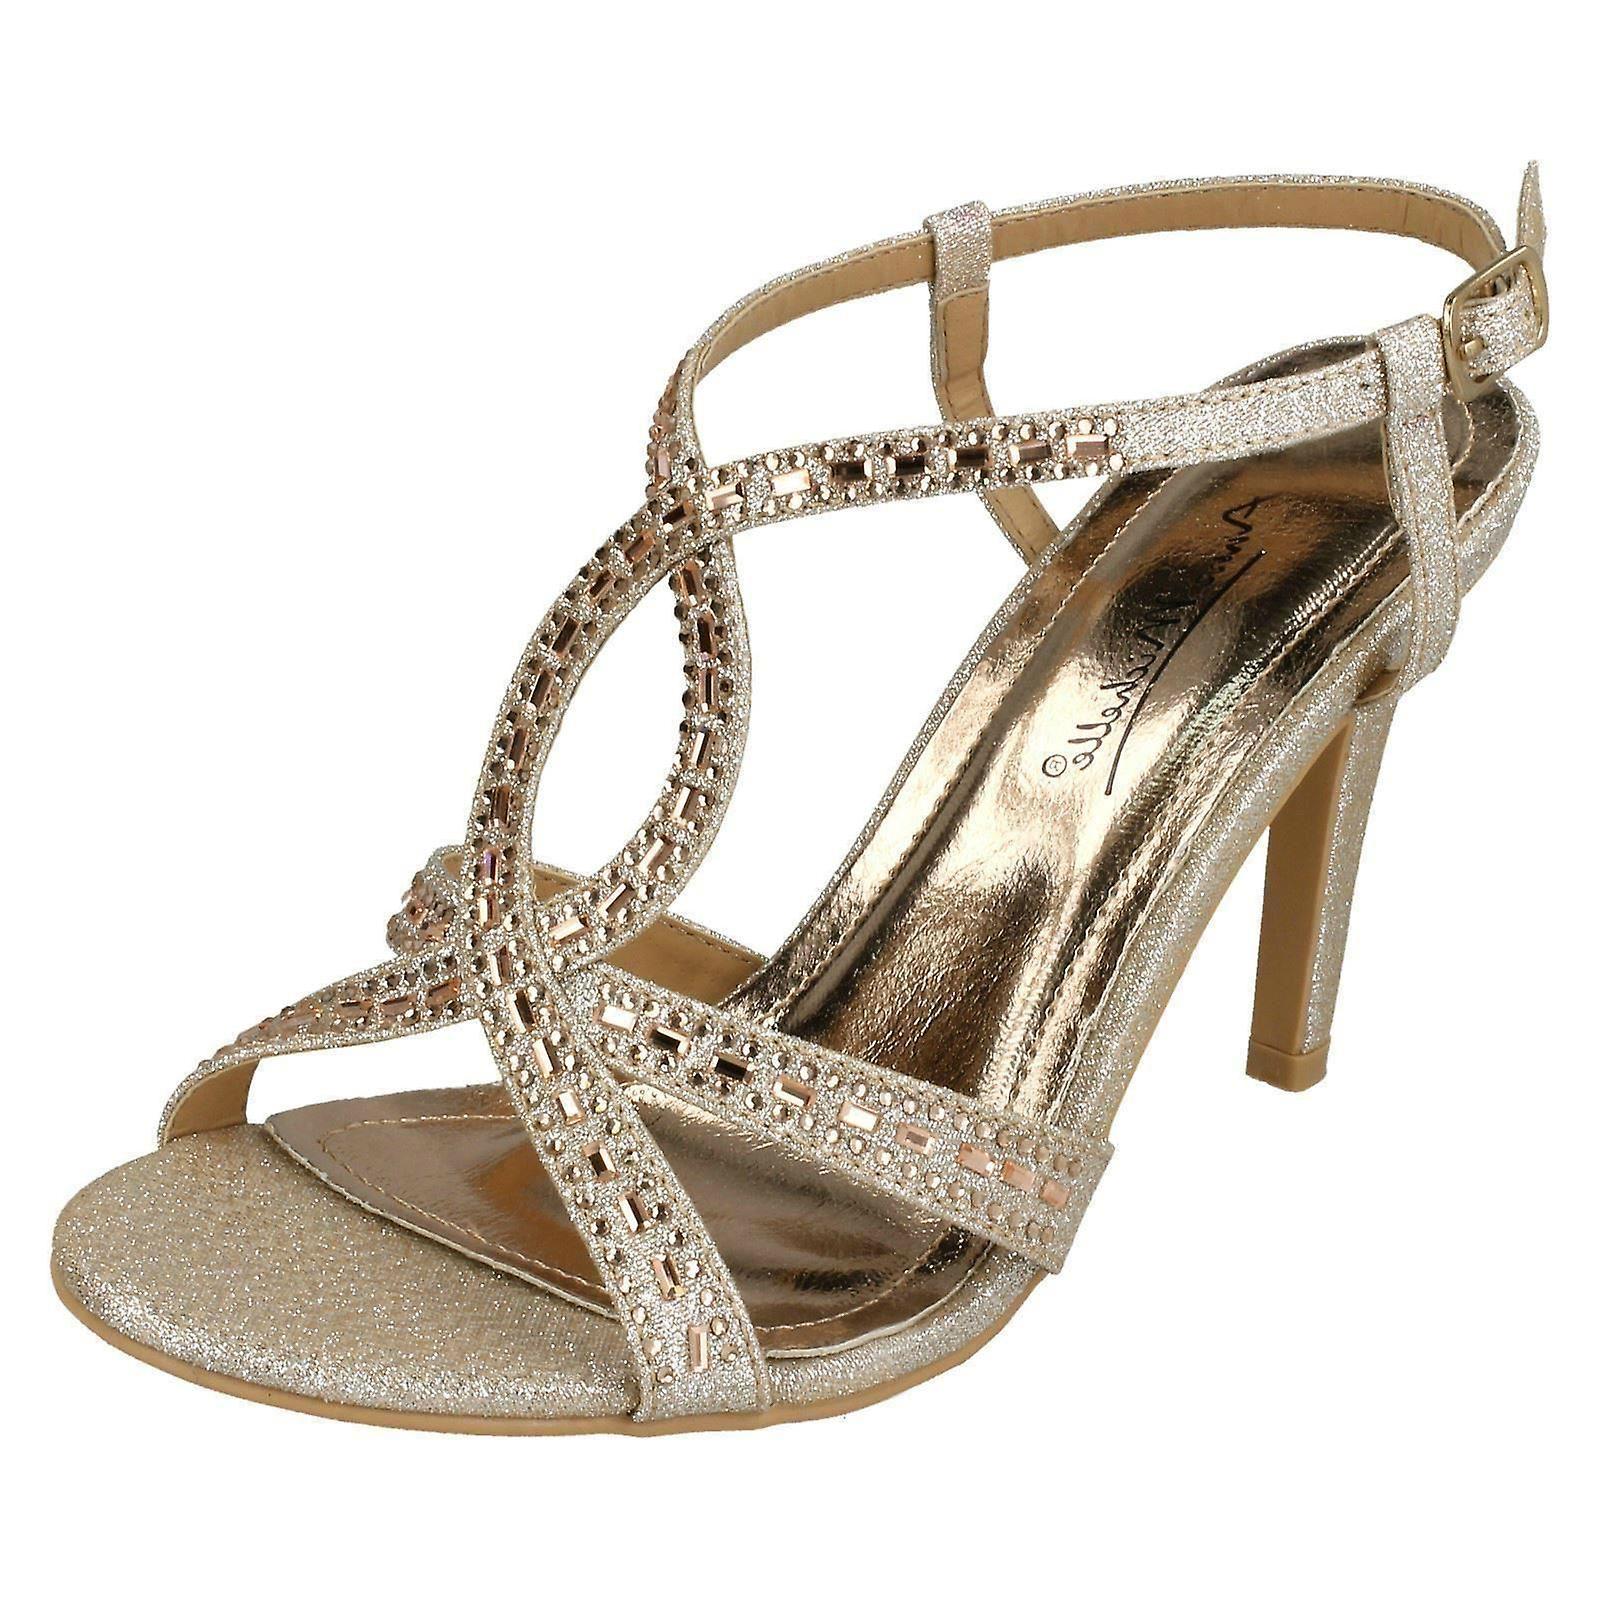 78f96ee624bd Ladies Anne Michelle Jewelled Strappy Sandals F10834 - Champagne Glitter -  UK Size 8 - EU